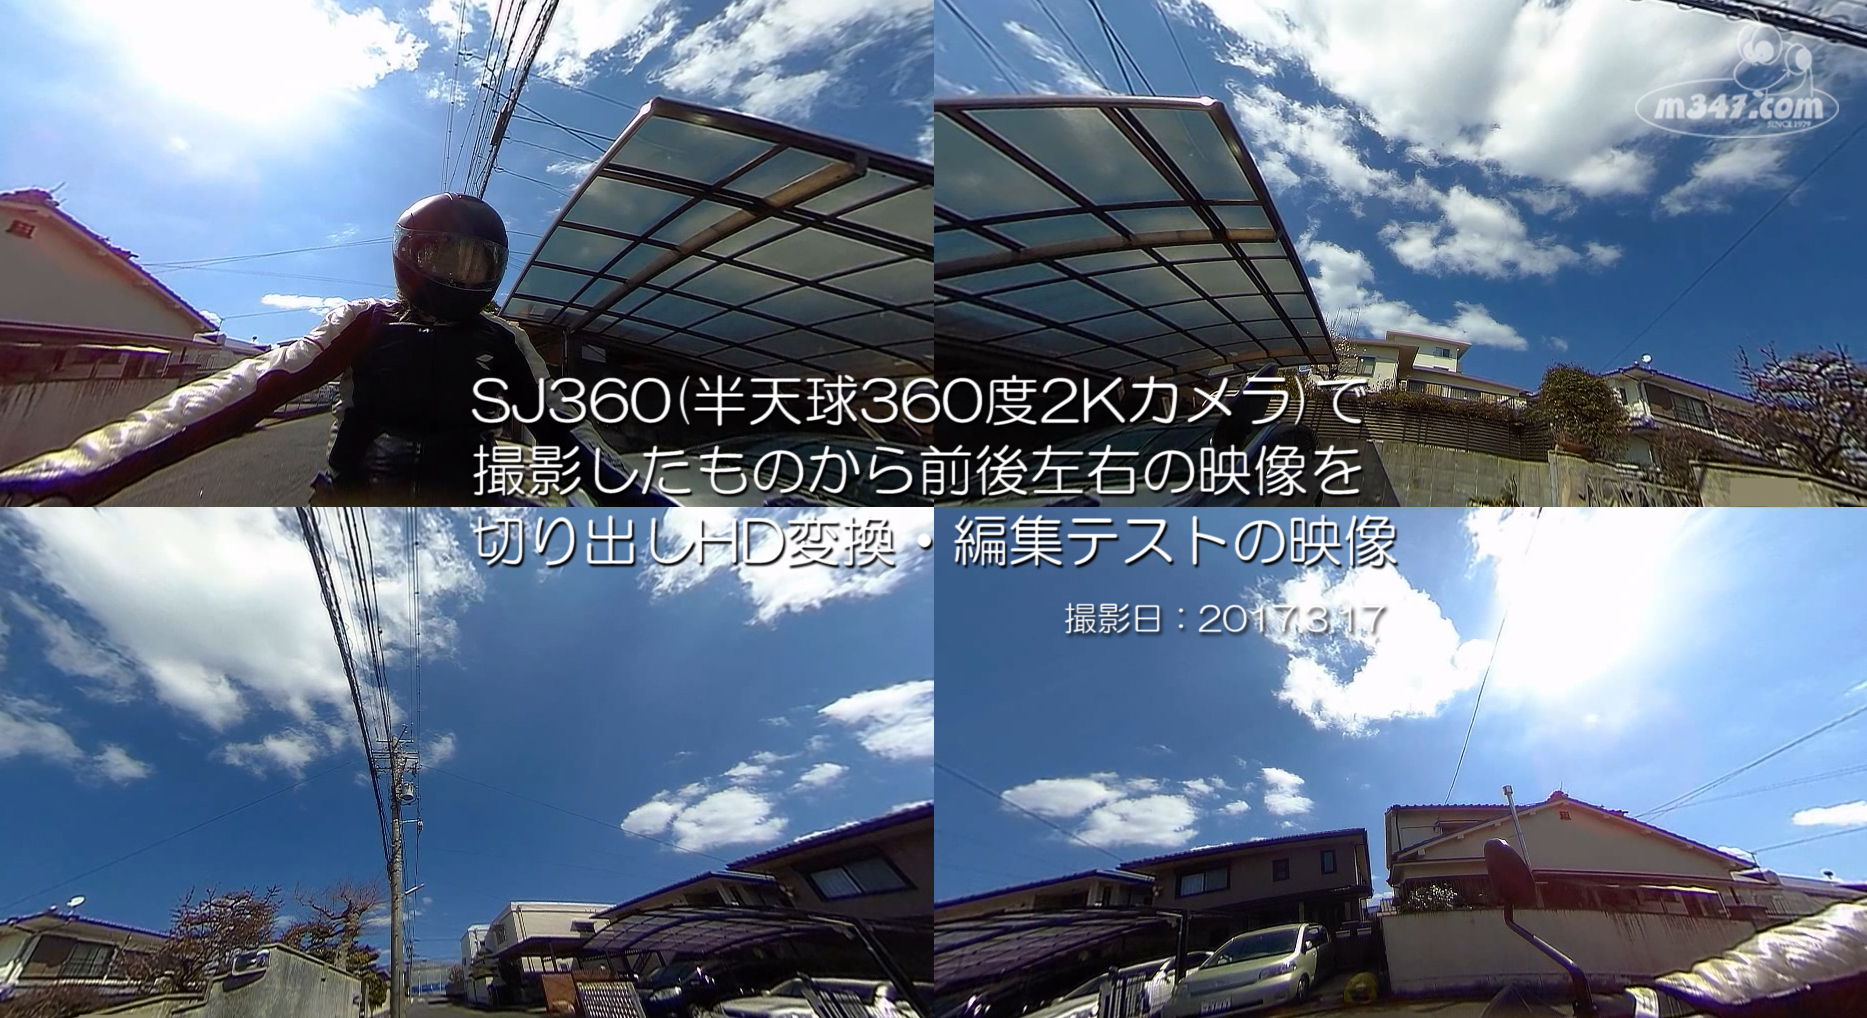 SJ360から切り出し編集テスト映像